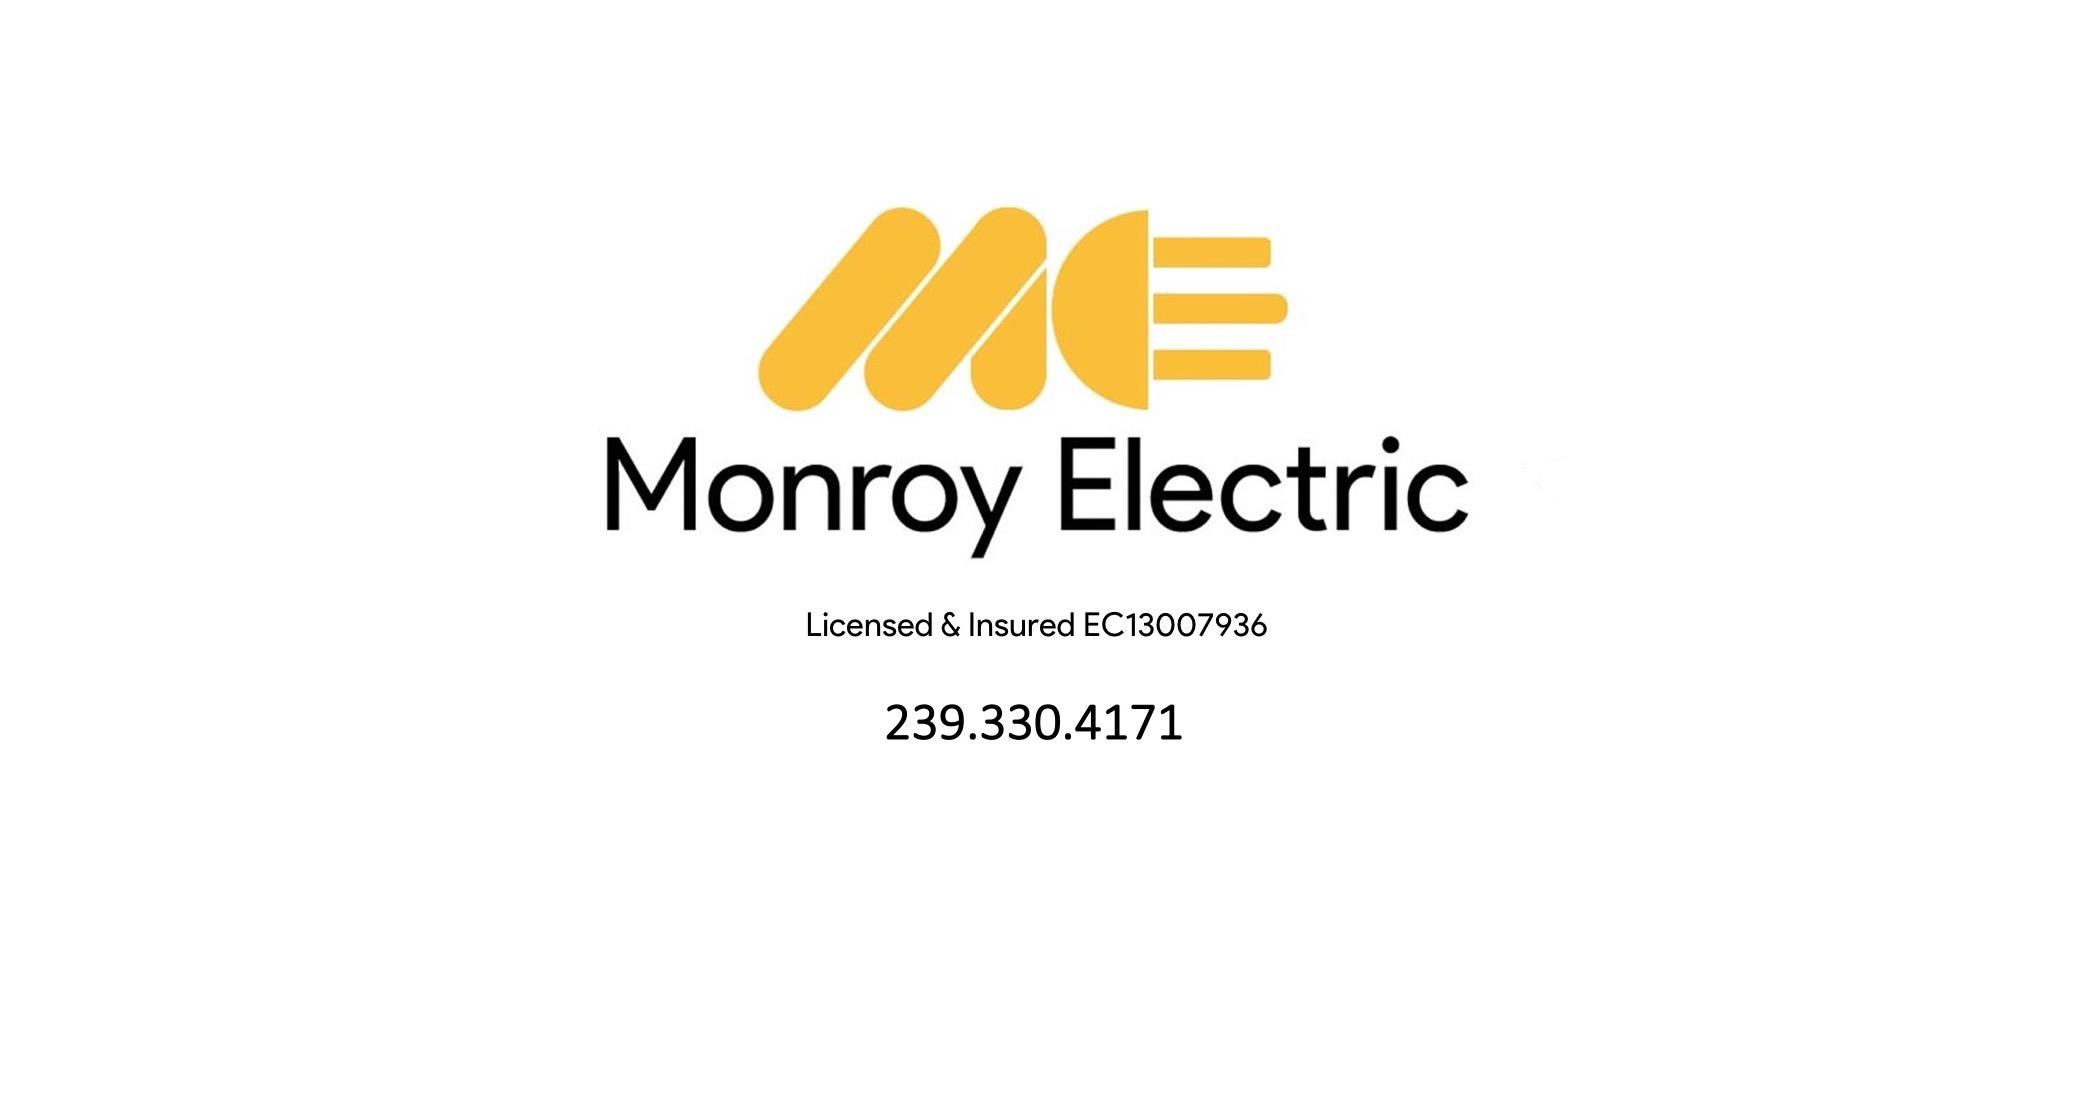 Monroy Electric